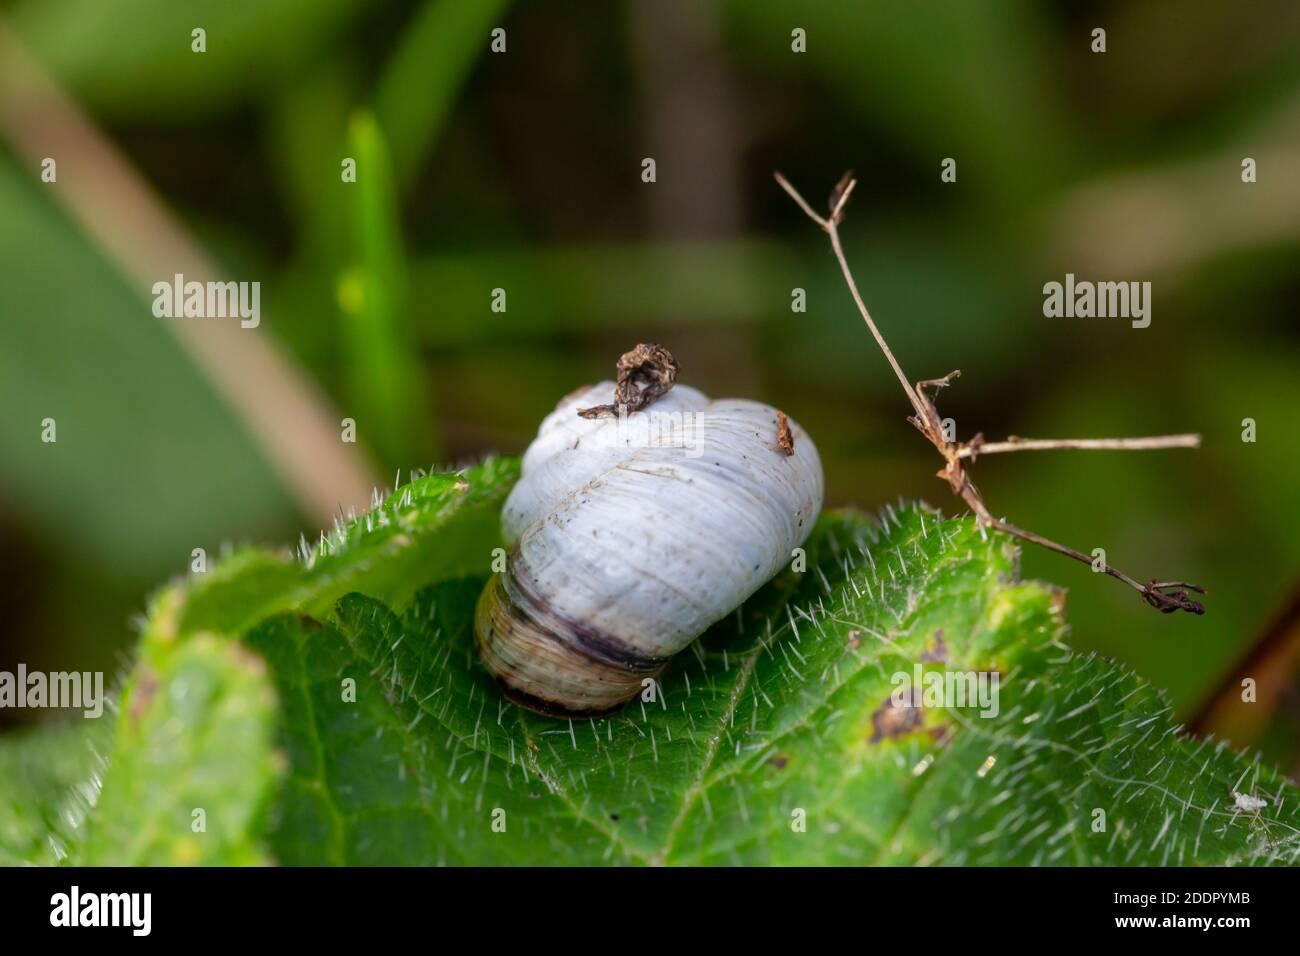 A macro image of a scrub snail or Genus Praticolella on a leaf close up Stock Photo